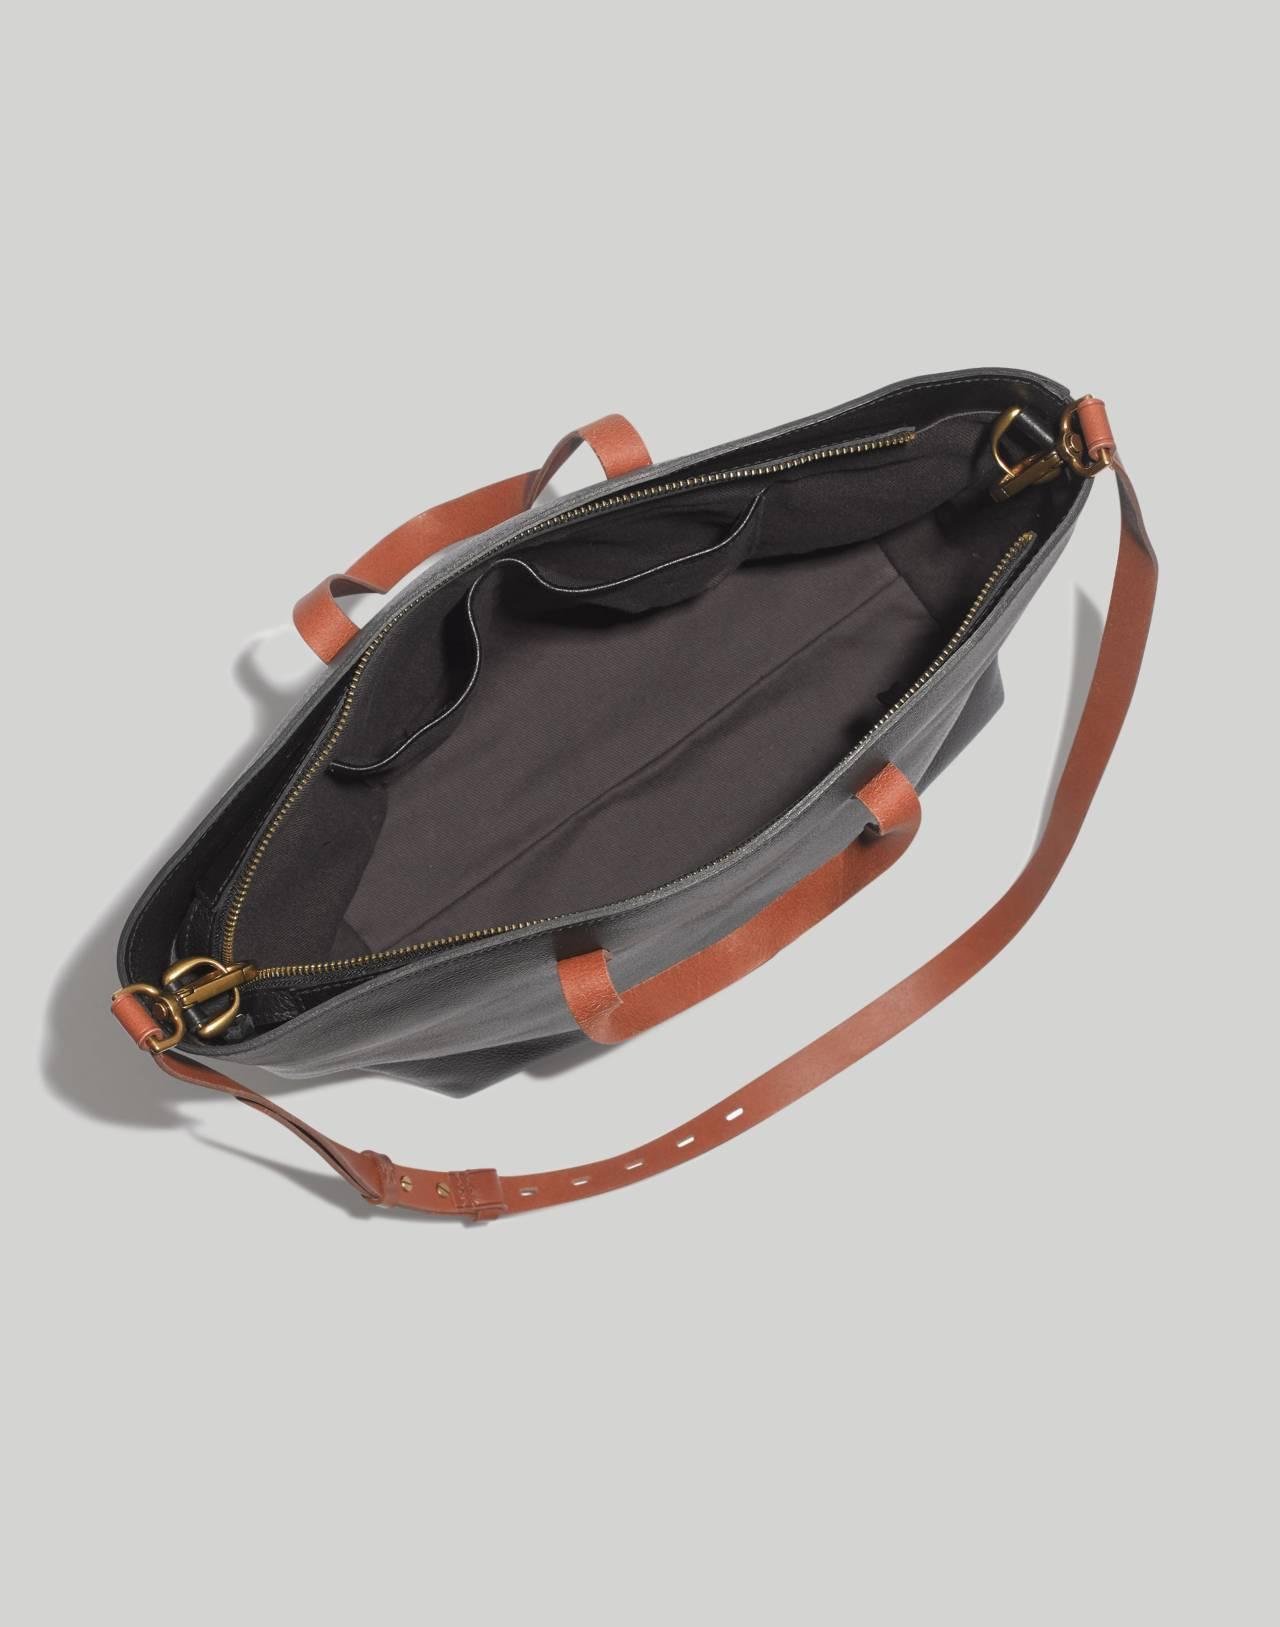 The Zip-Top Transport Carryall in true black brown image 2